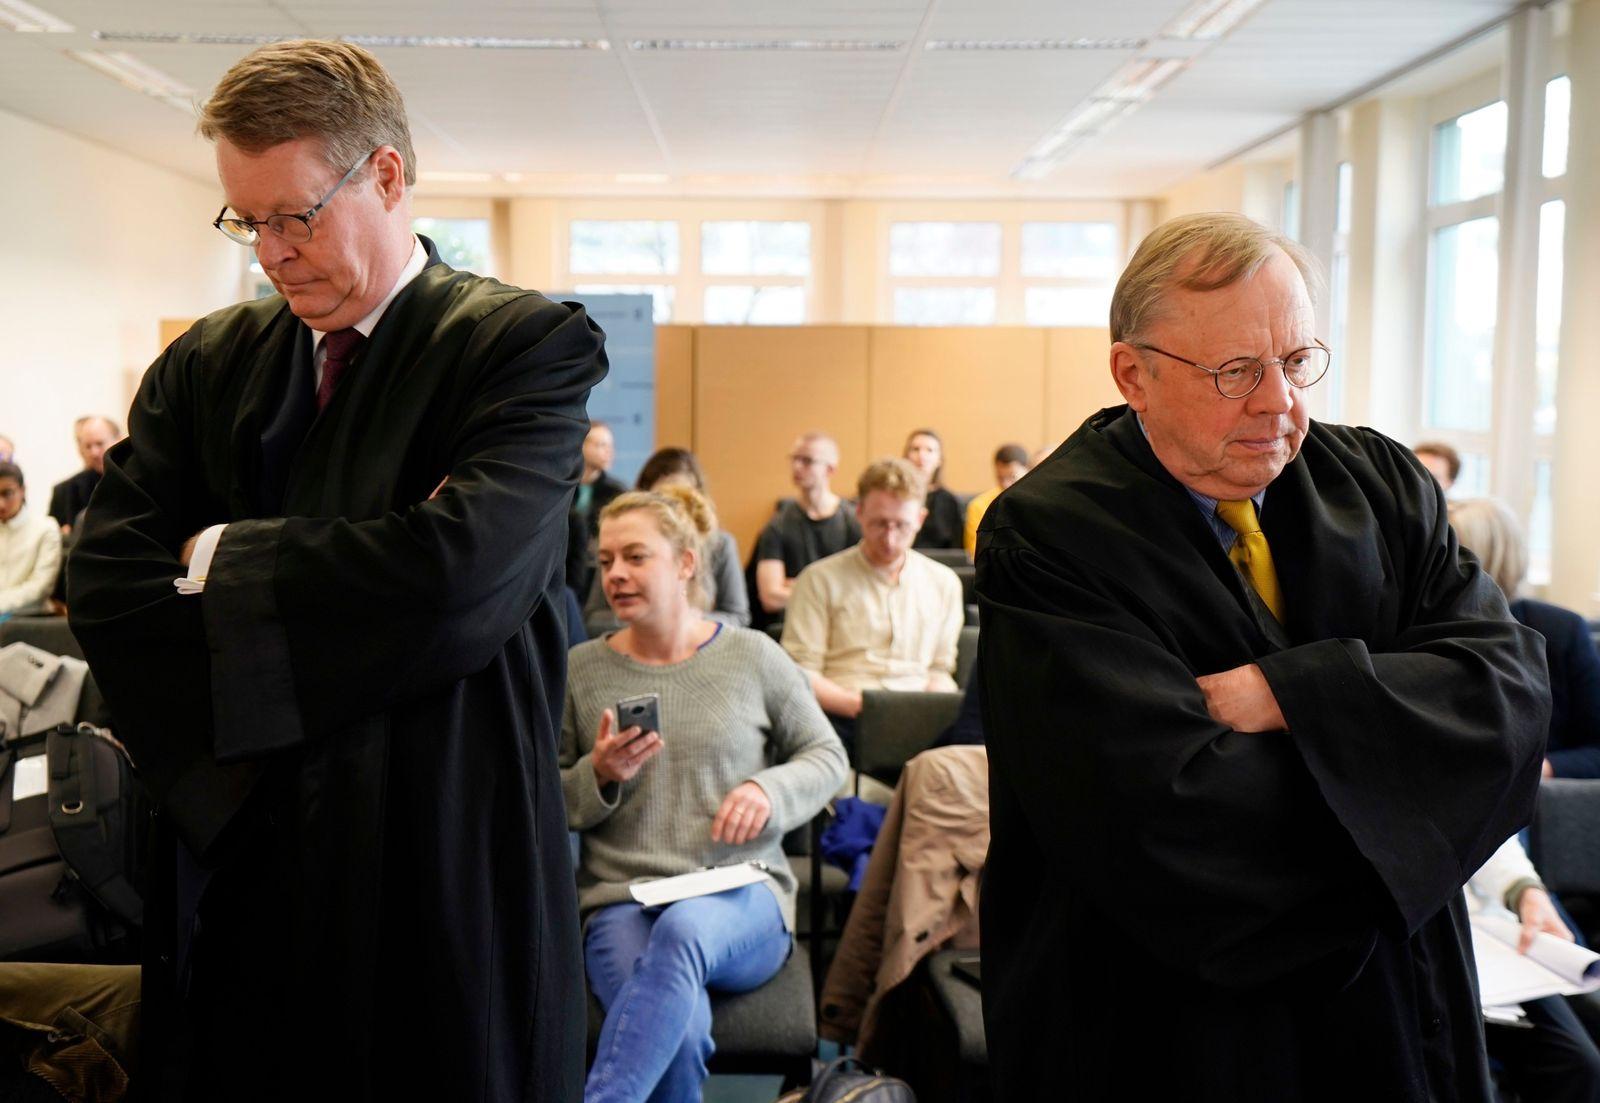 Böhmermann/ Merkel/ Prozess